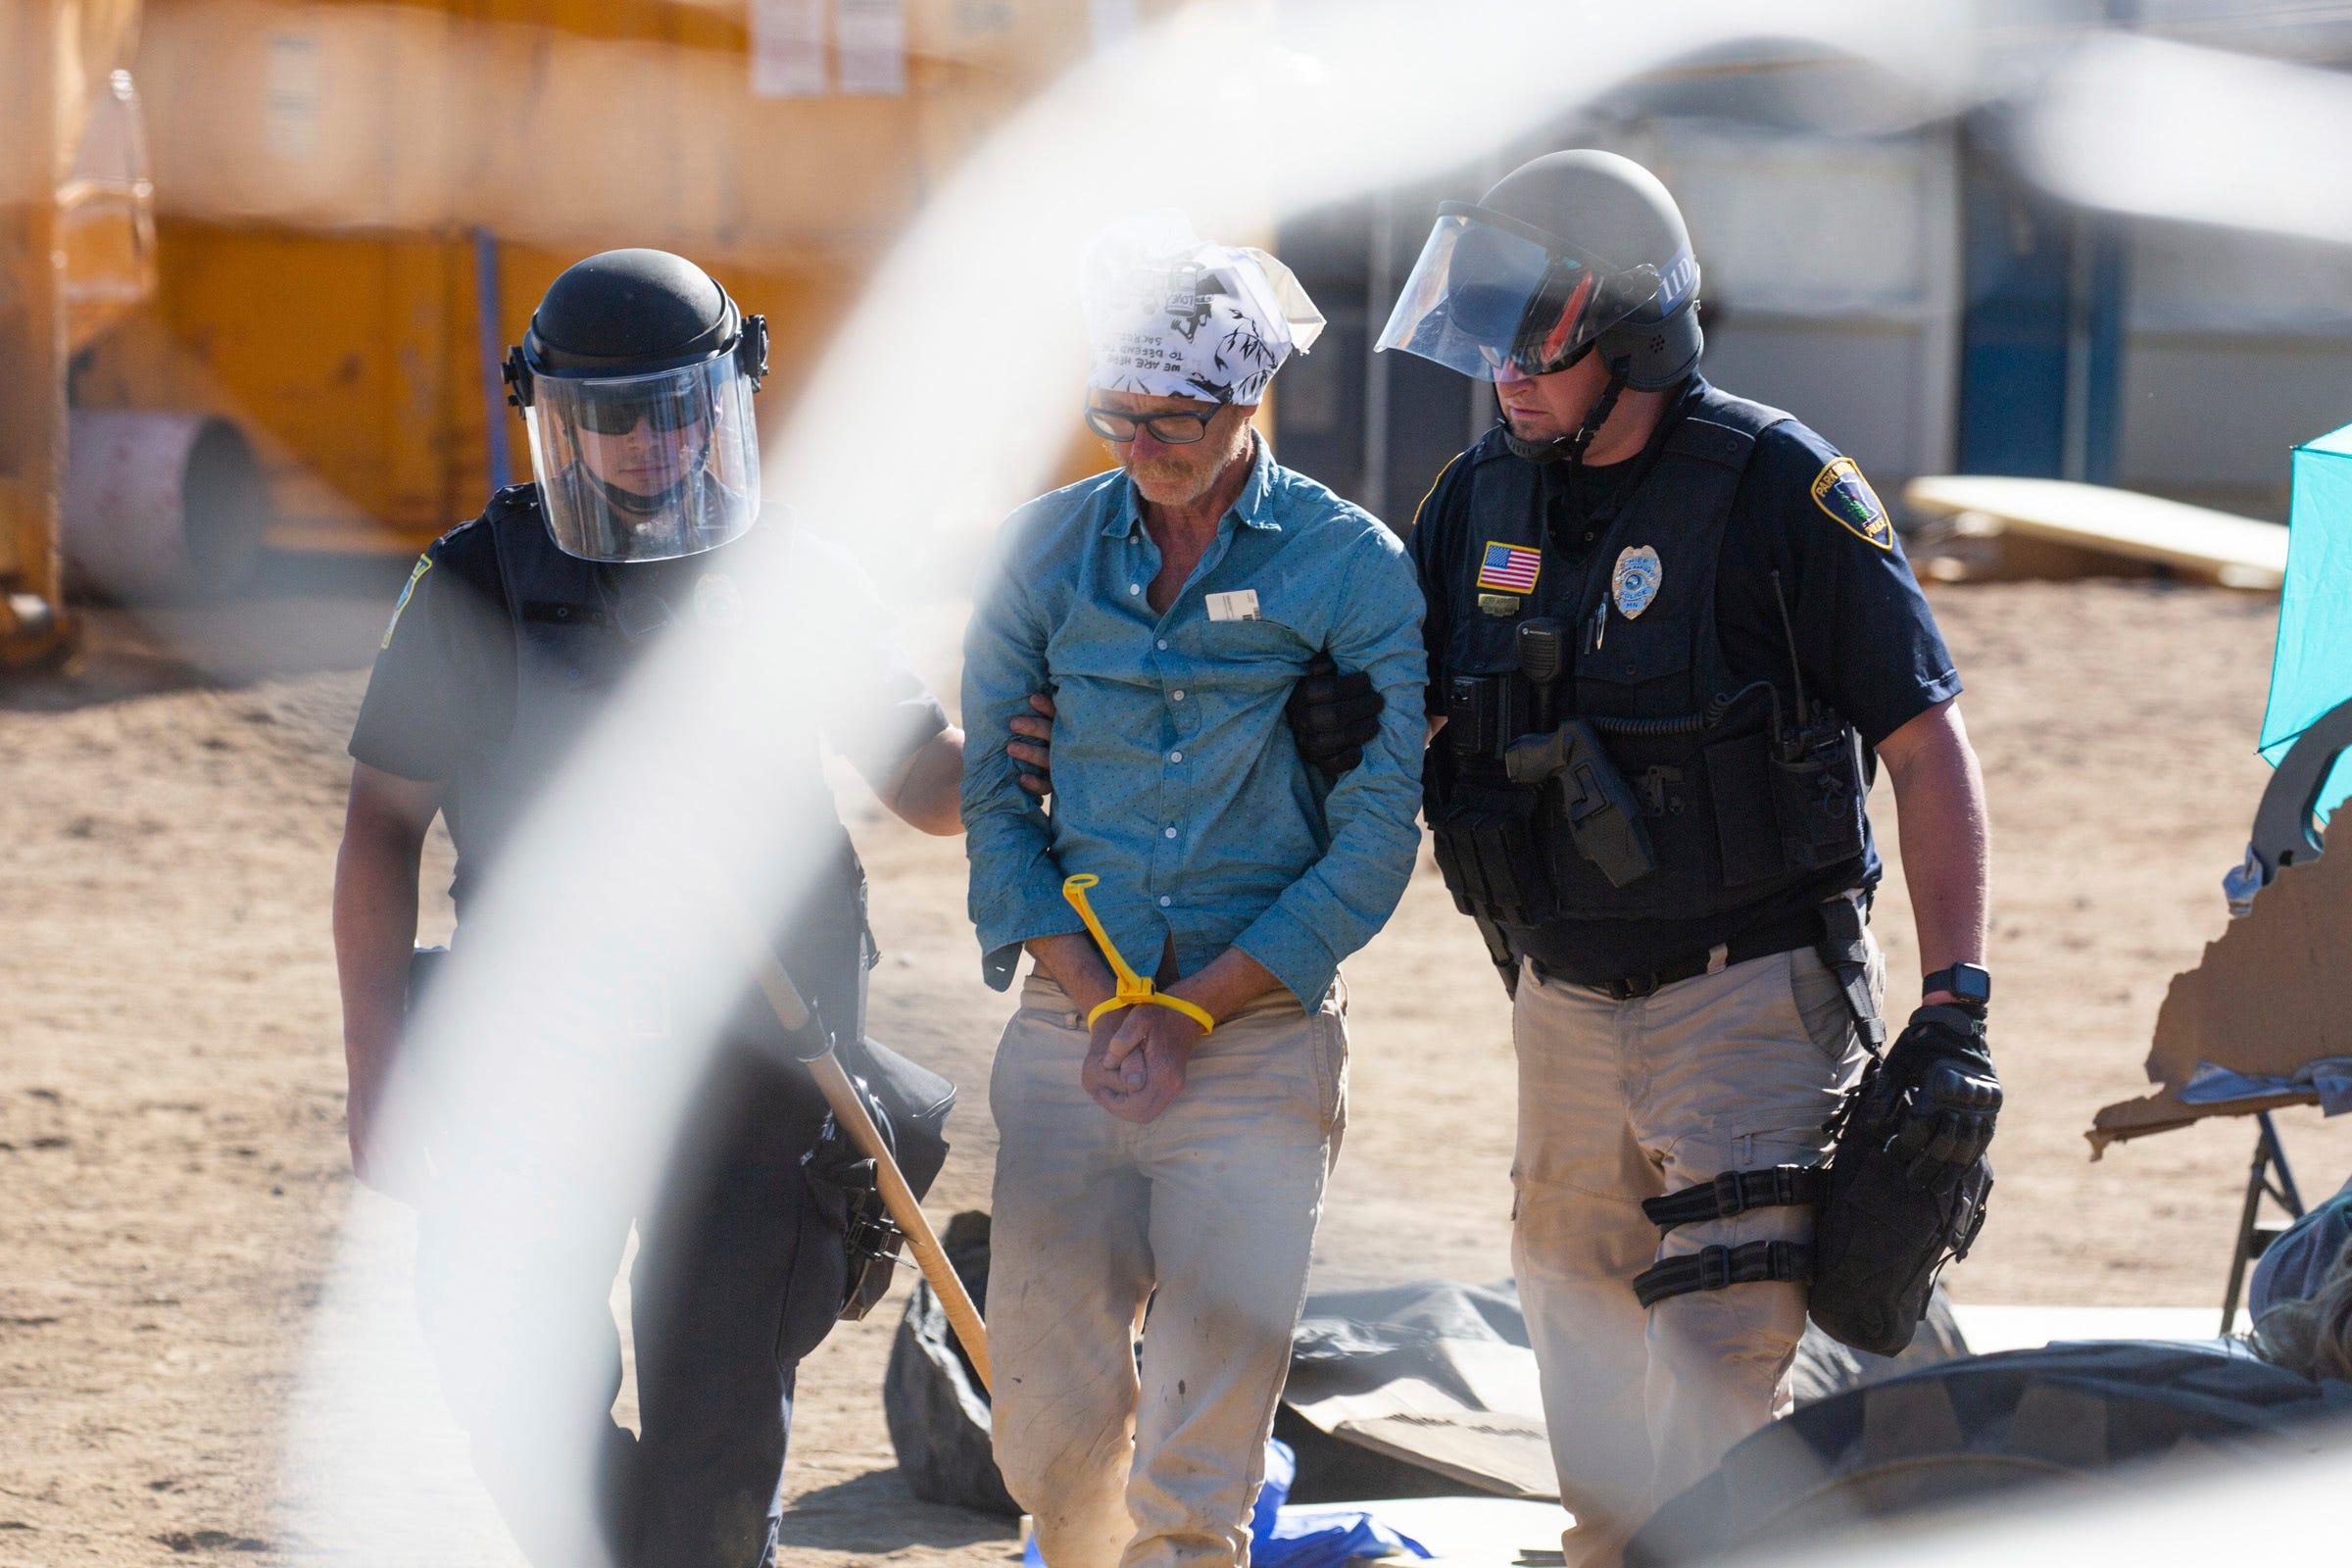 Protesters maintain blockade at Minnesota oil pipeline site 2